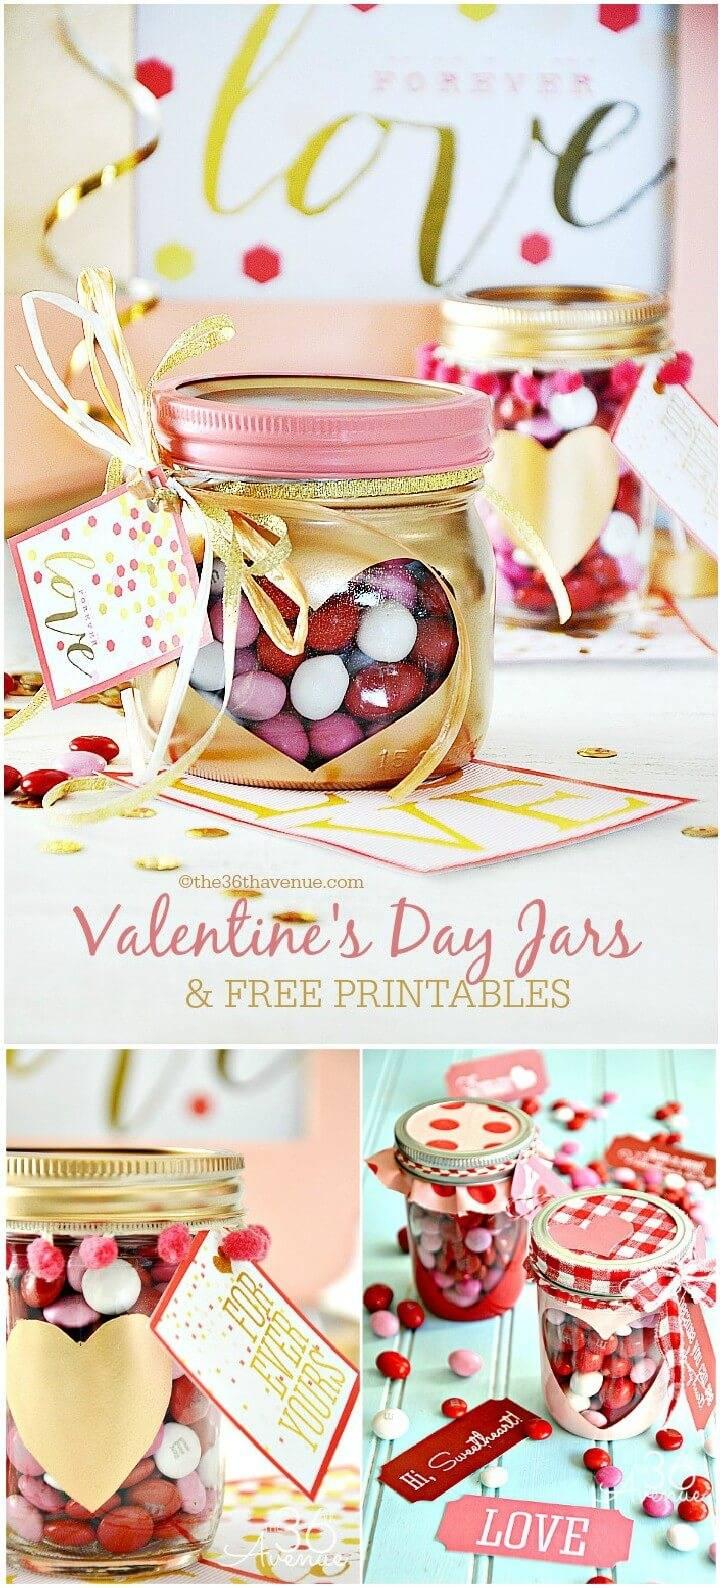 DIY Precious Valentine's Day Mason Jar Gifts